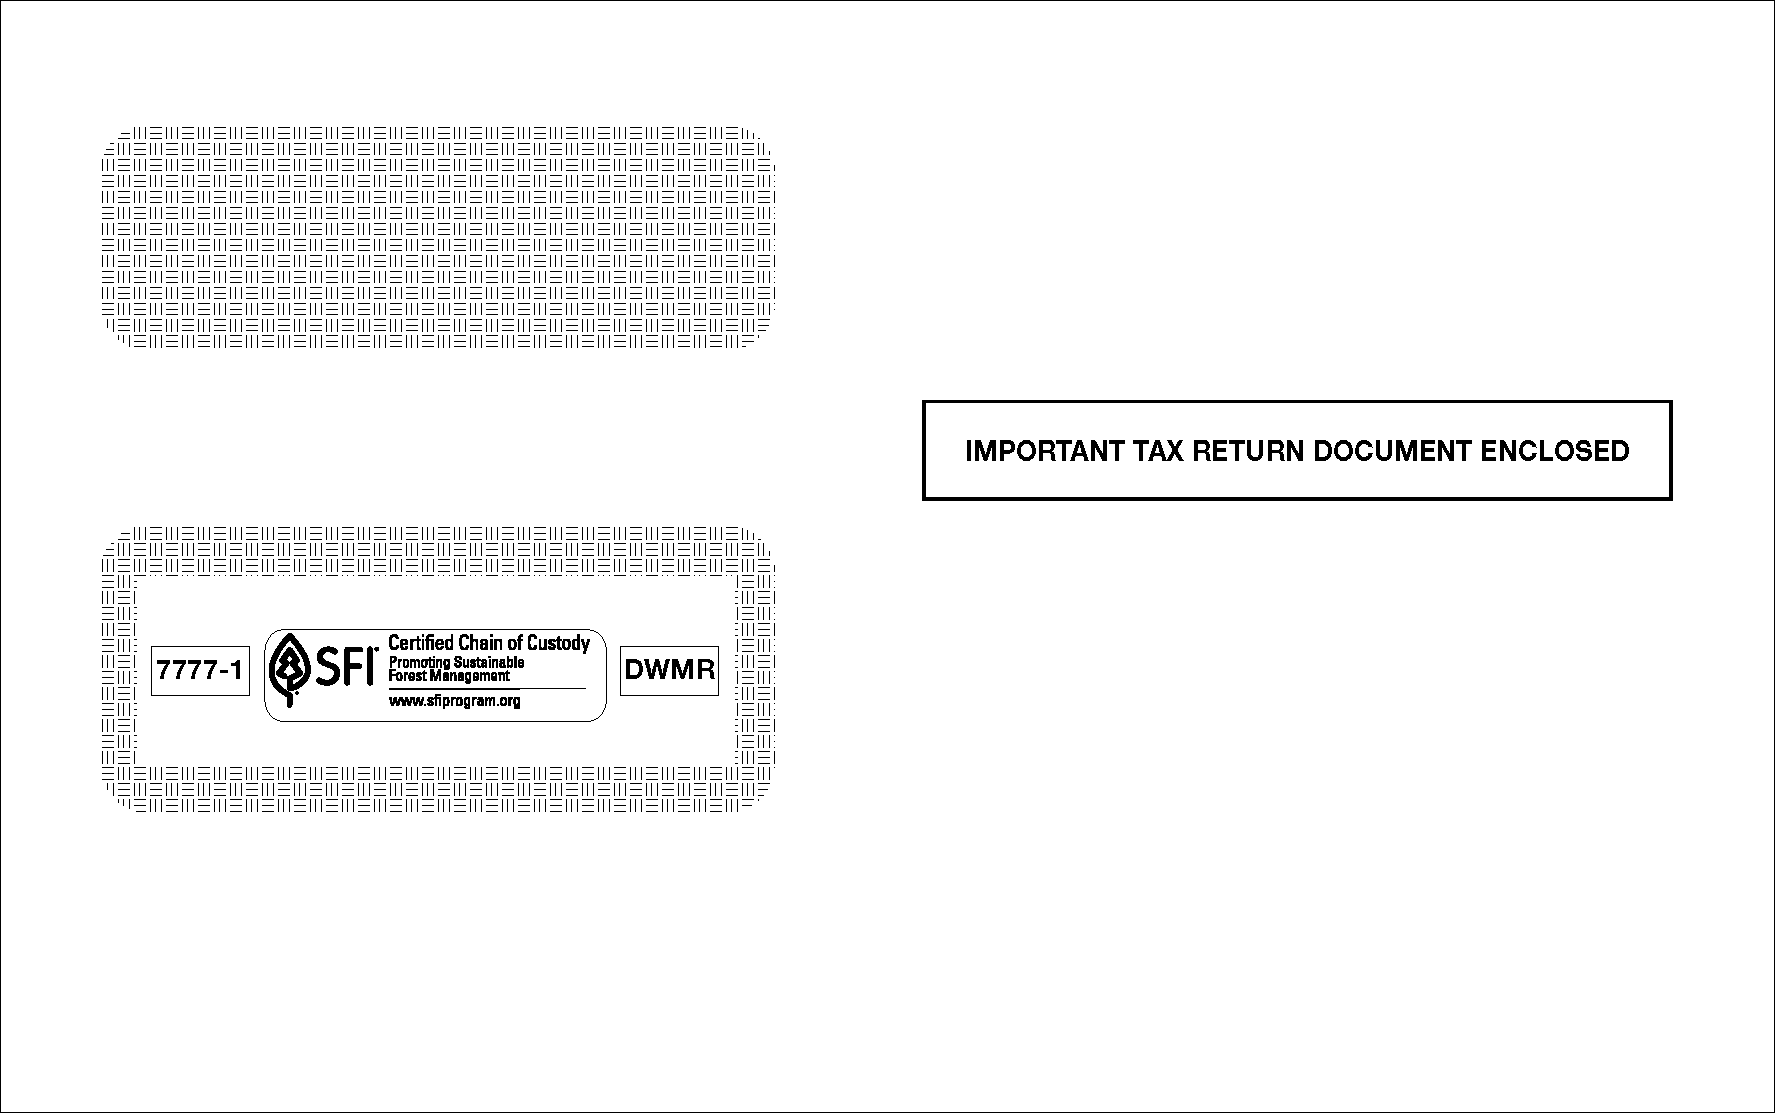 W2 & 1099 Envelopes